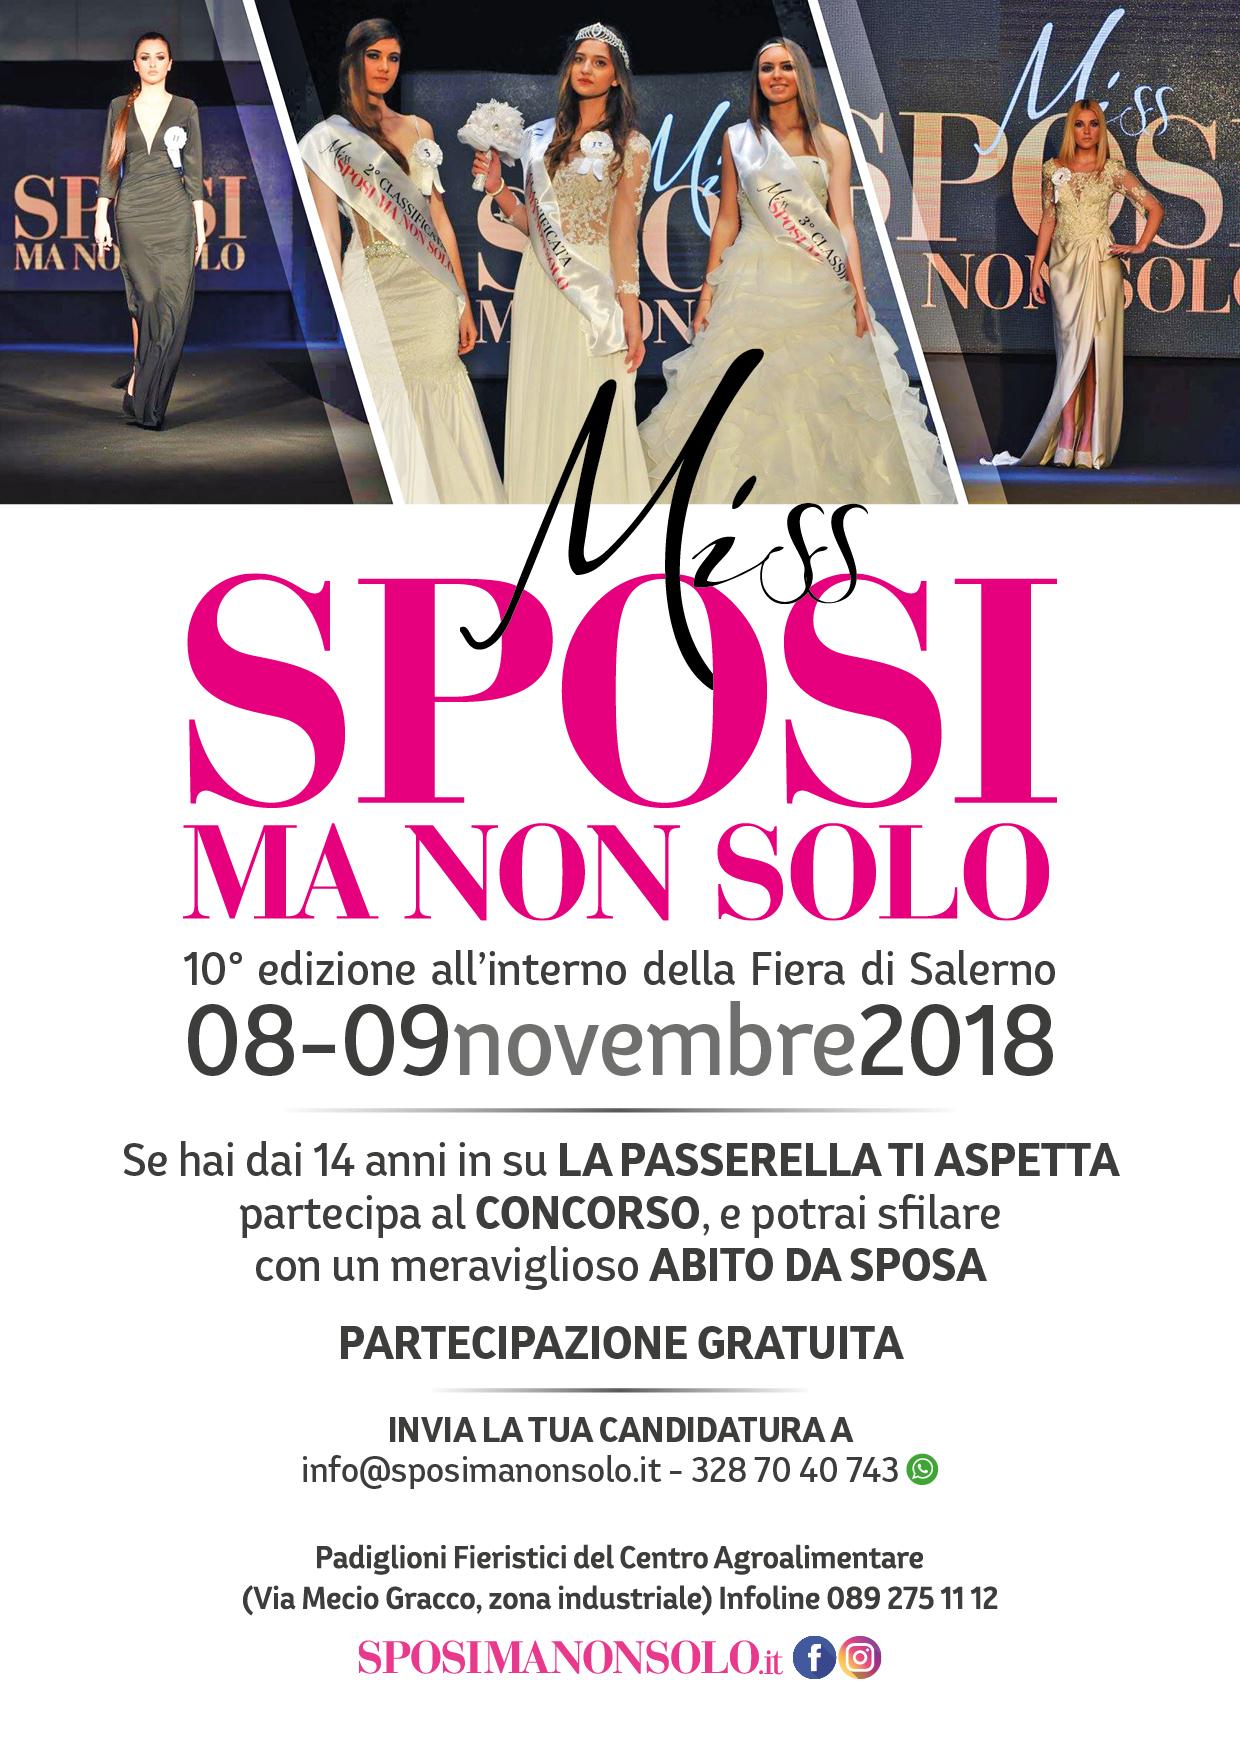 LOCANDINA MISS Sposimanonsolo 2018